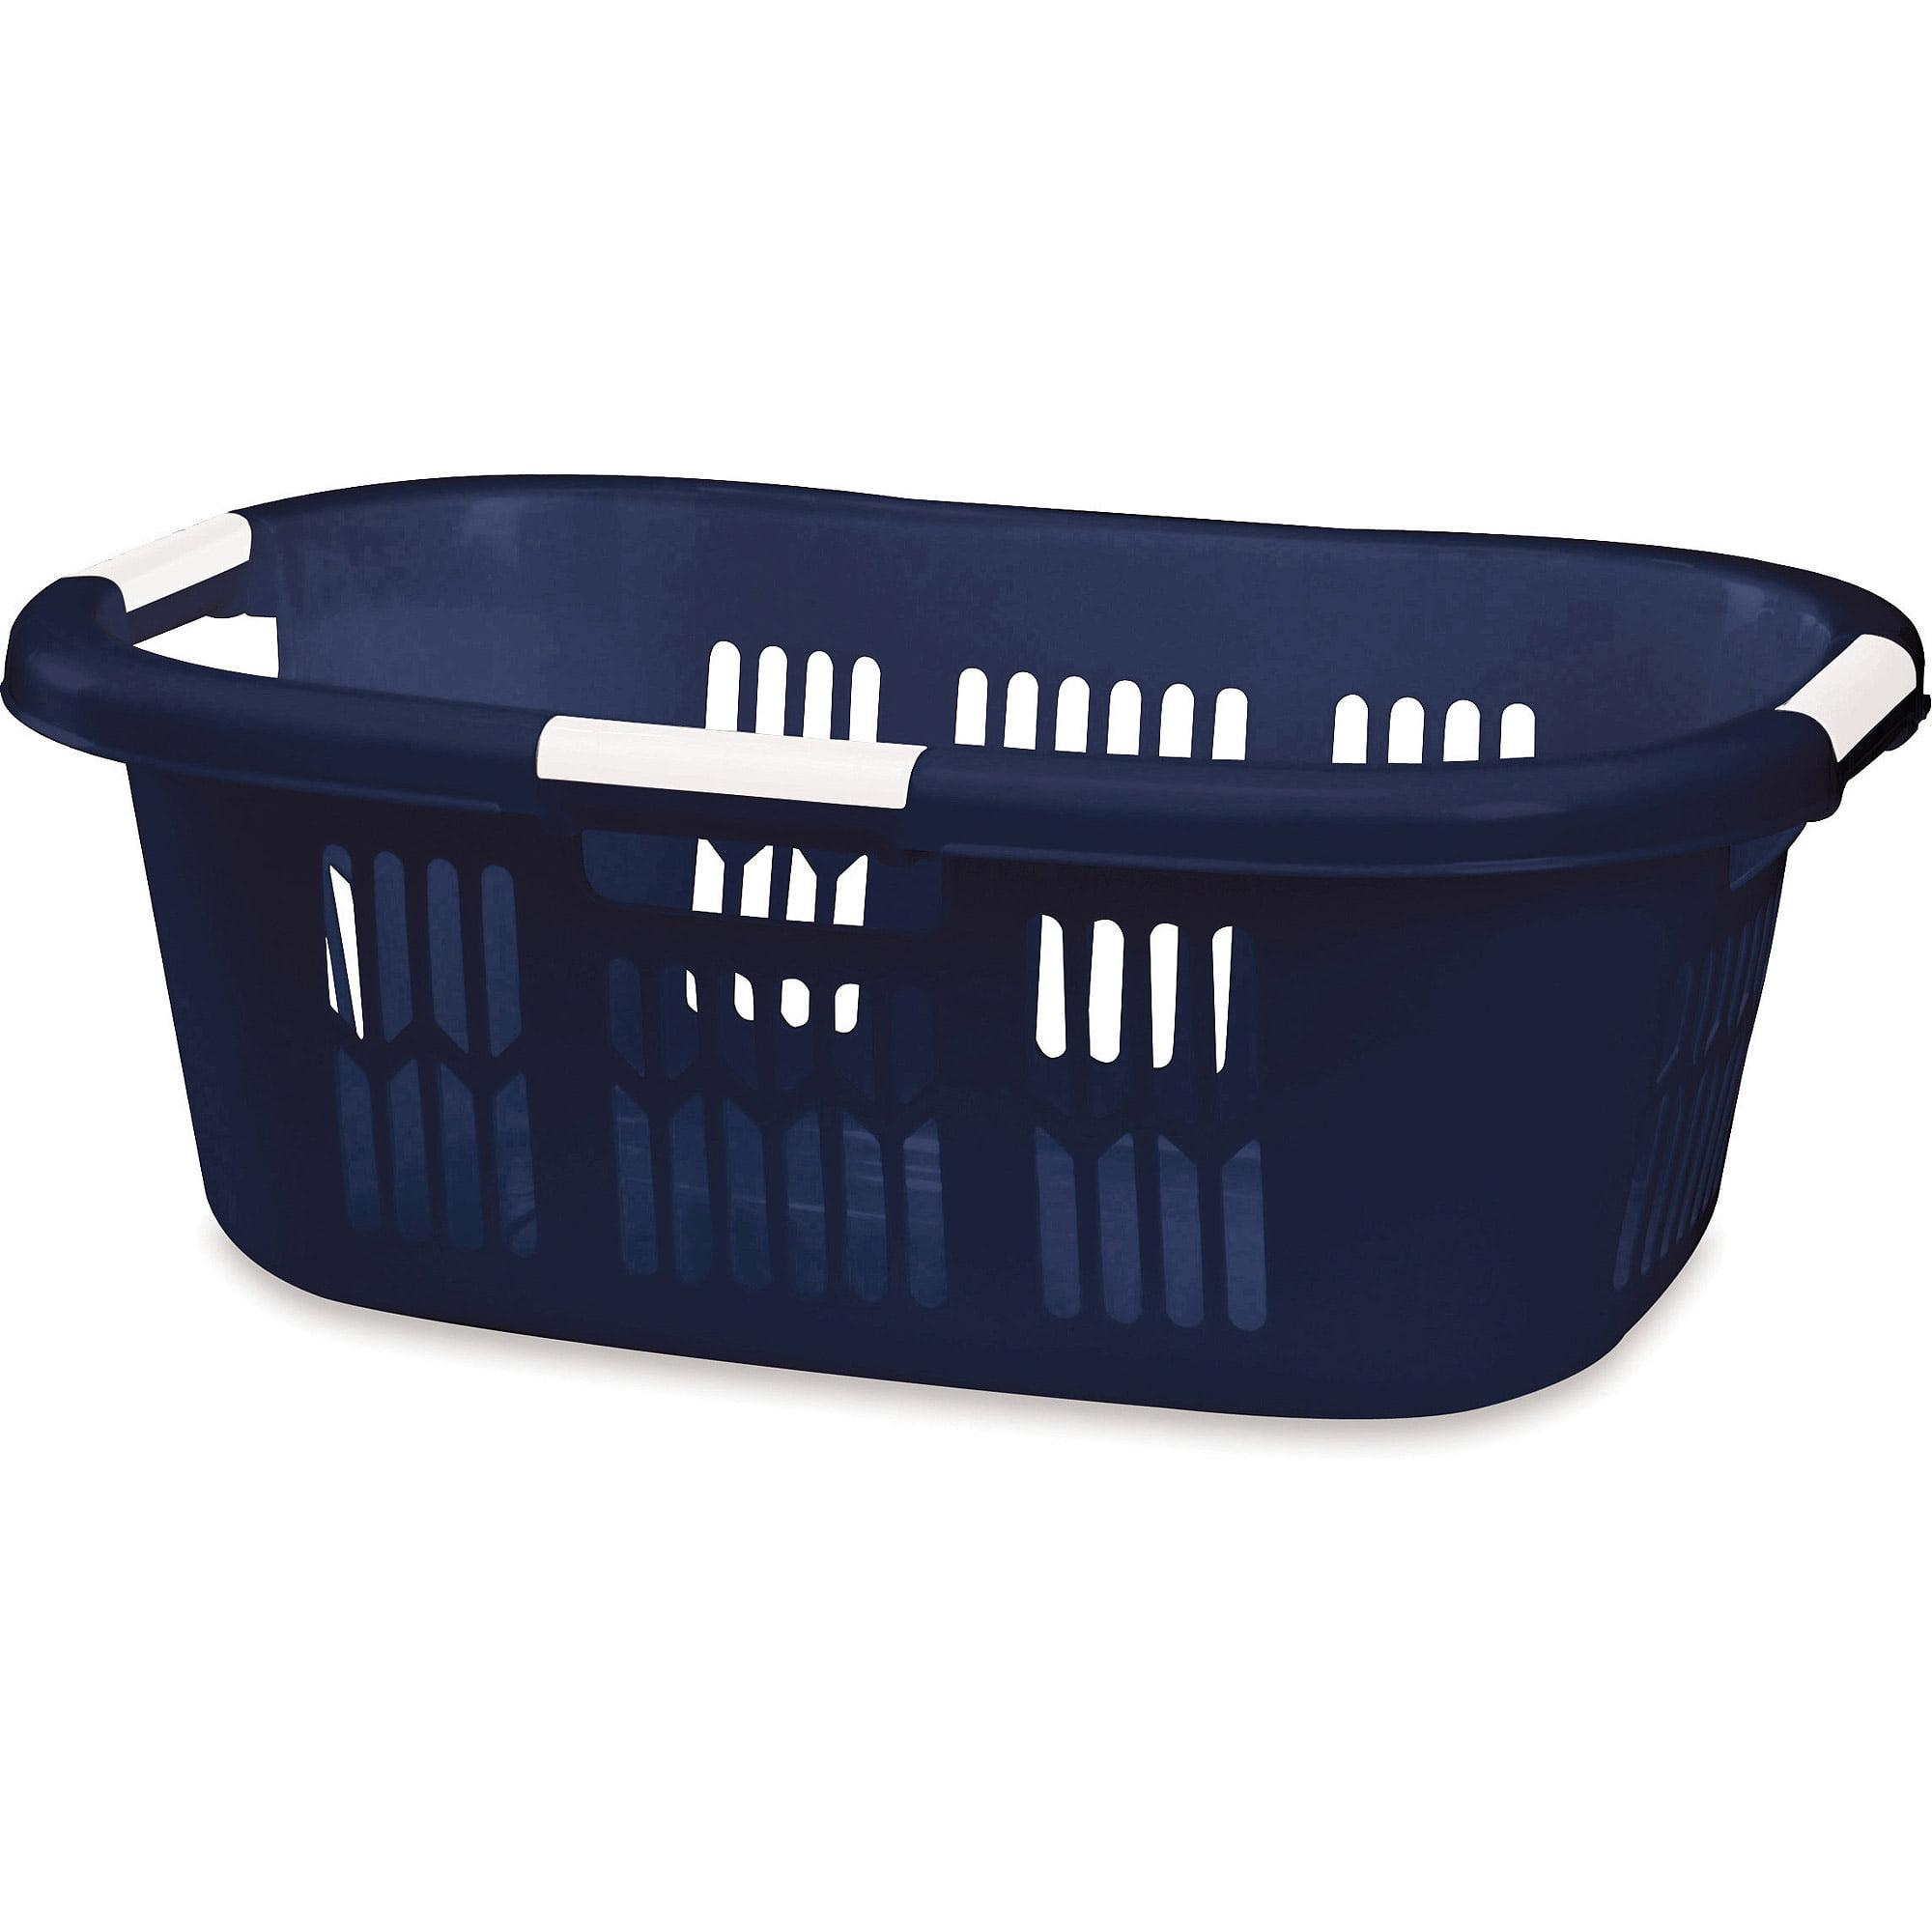 Rubbermaid 1.5 BU Hip-Hugger Laundry Basket